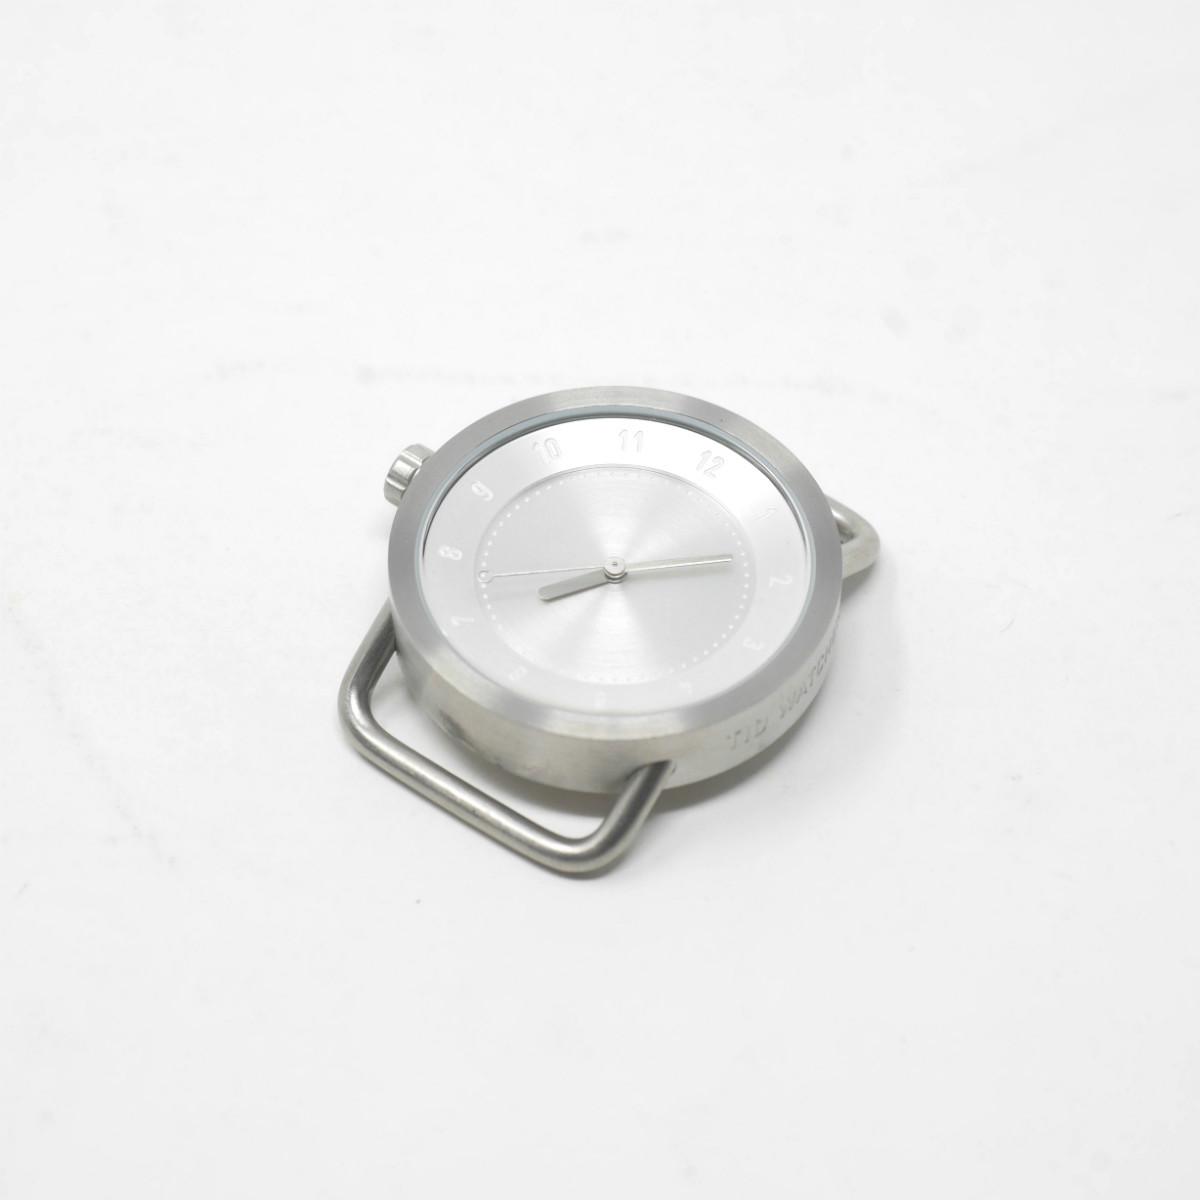 TID Watches No.1 36mm フェイス シルバー(ティッドウォッチ)※バンド別売